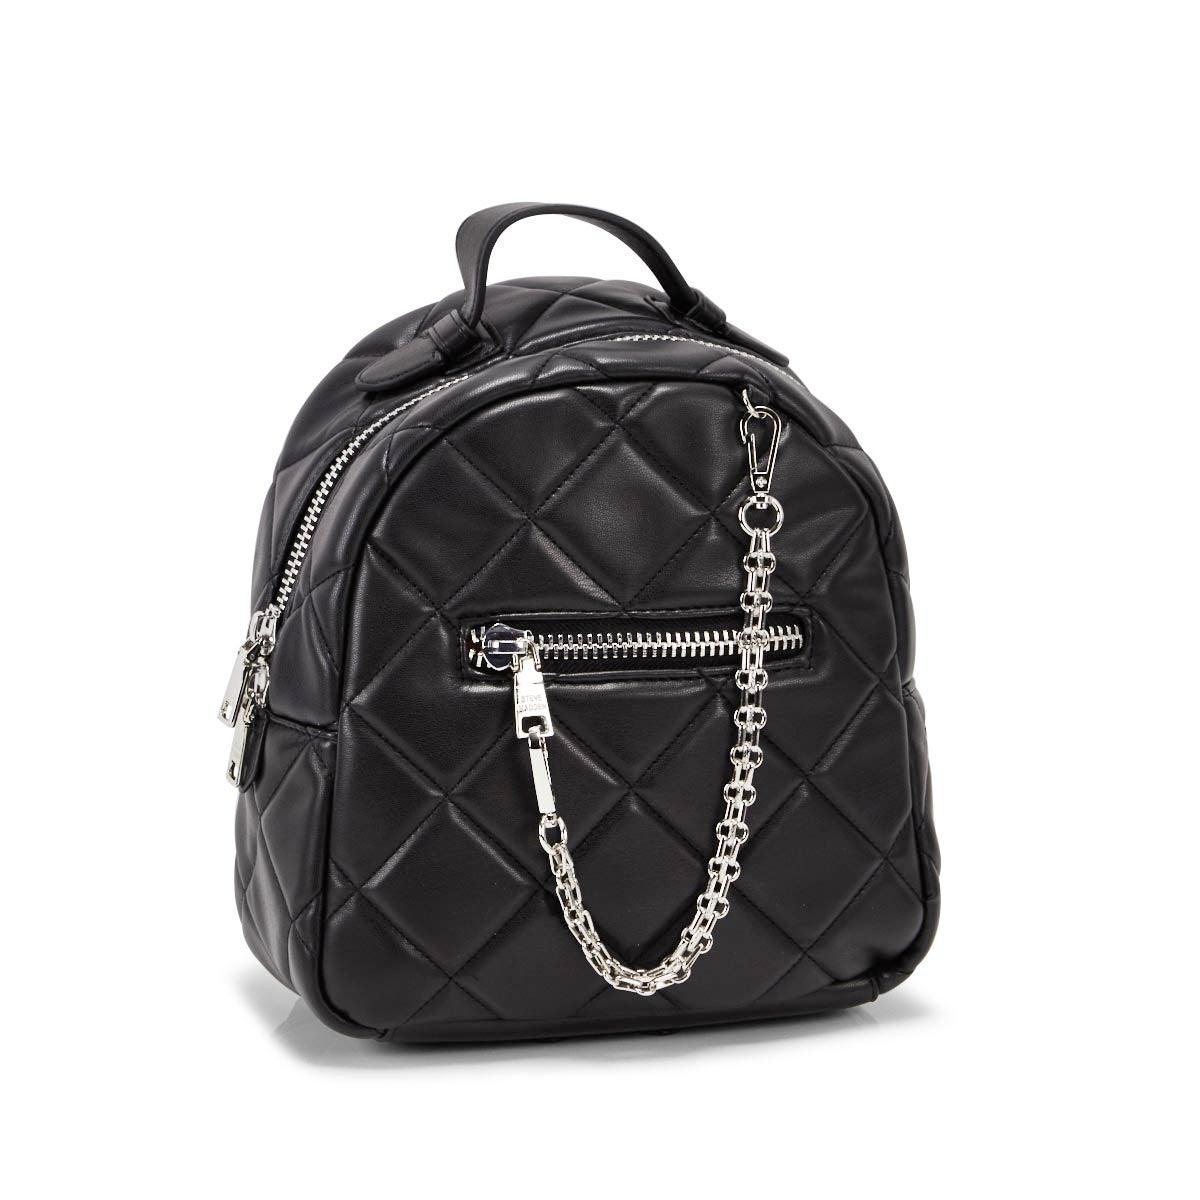 Lds BSelma black fashion backpack